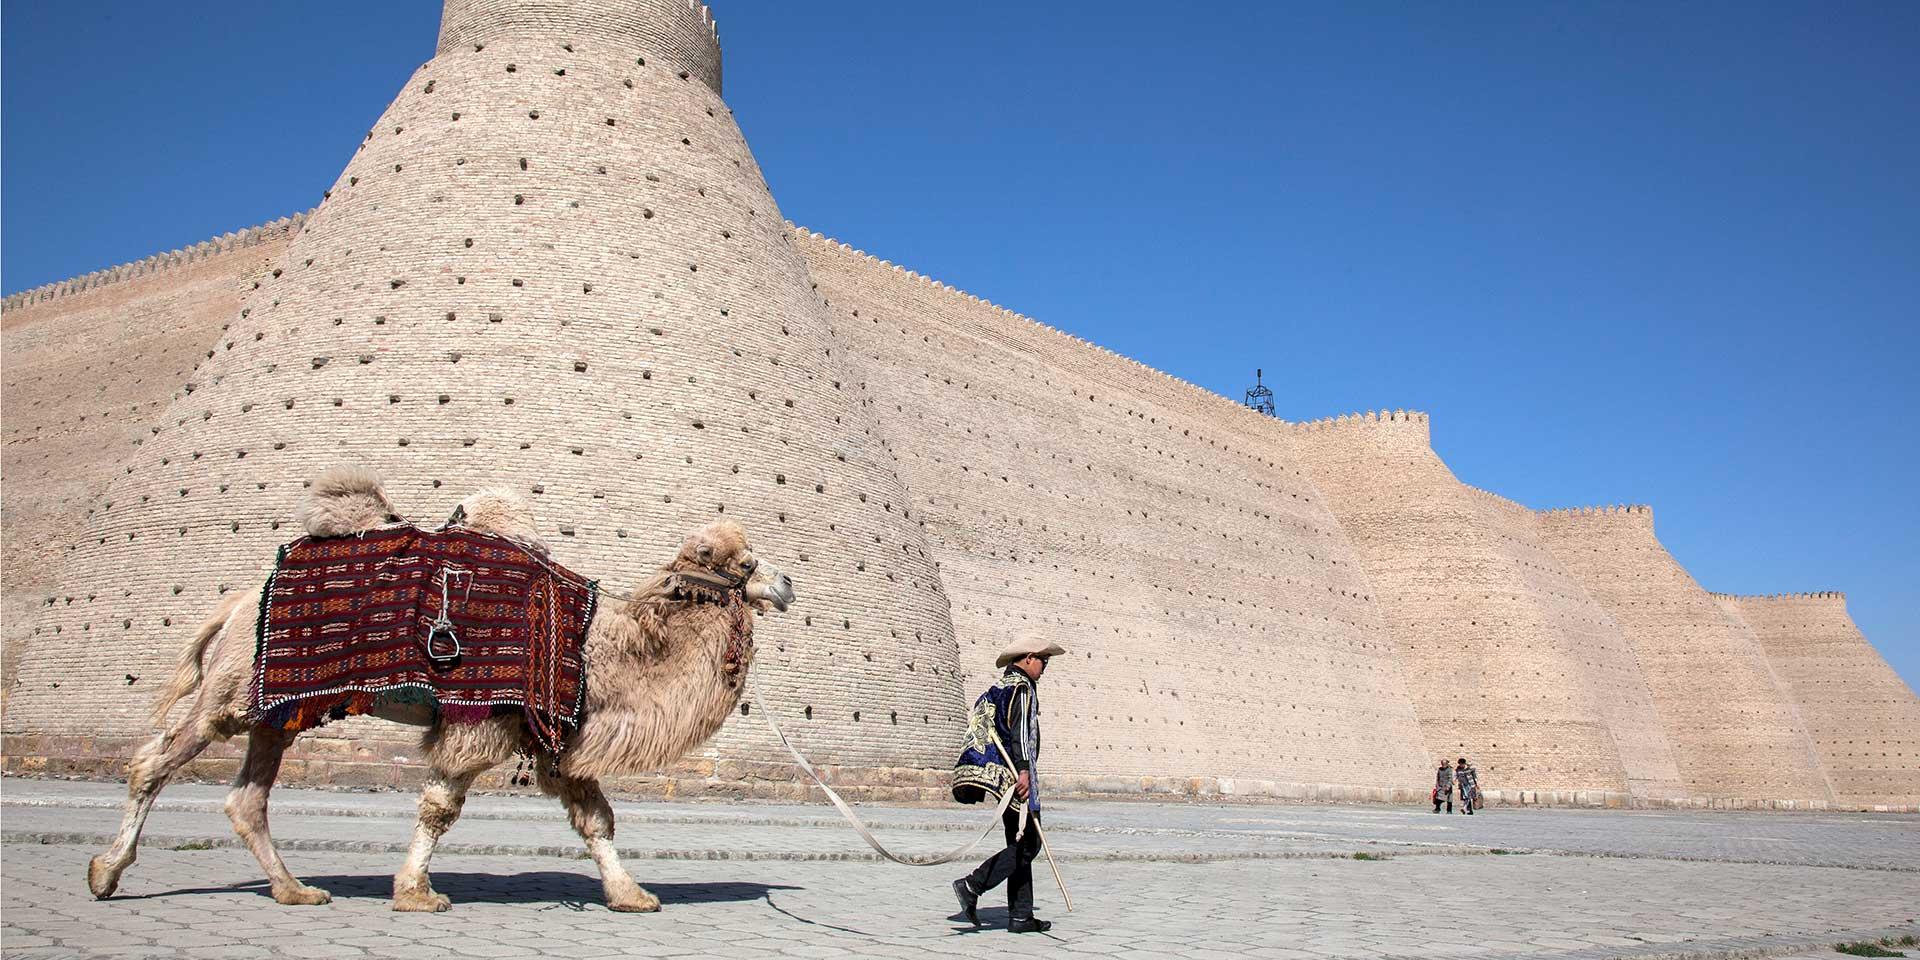 Bukhara's Mosques, Markets & Madrassas